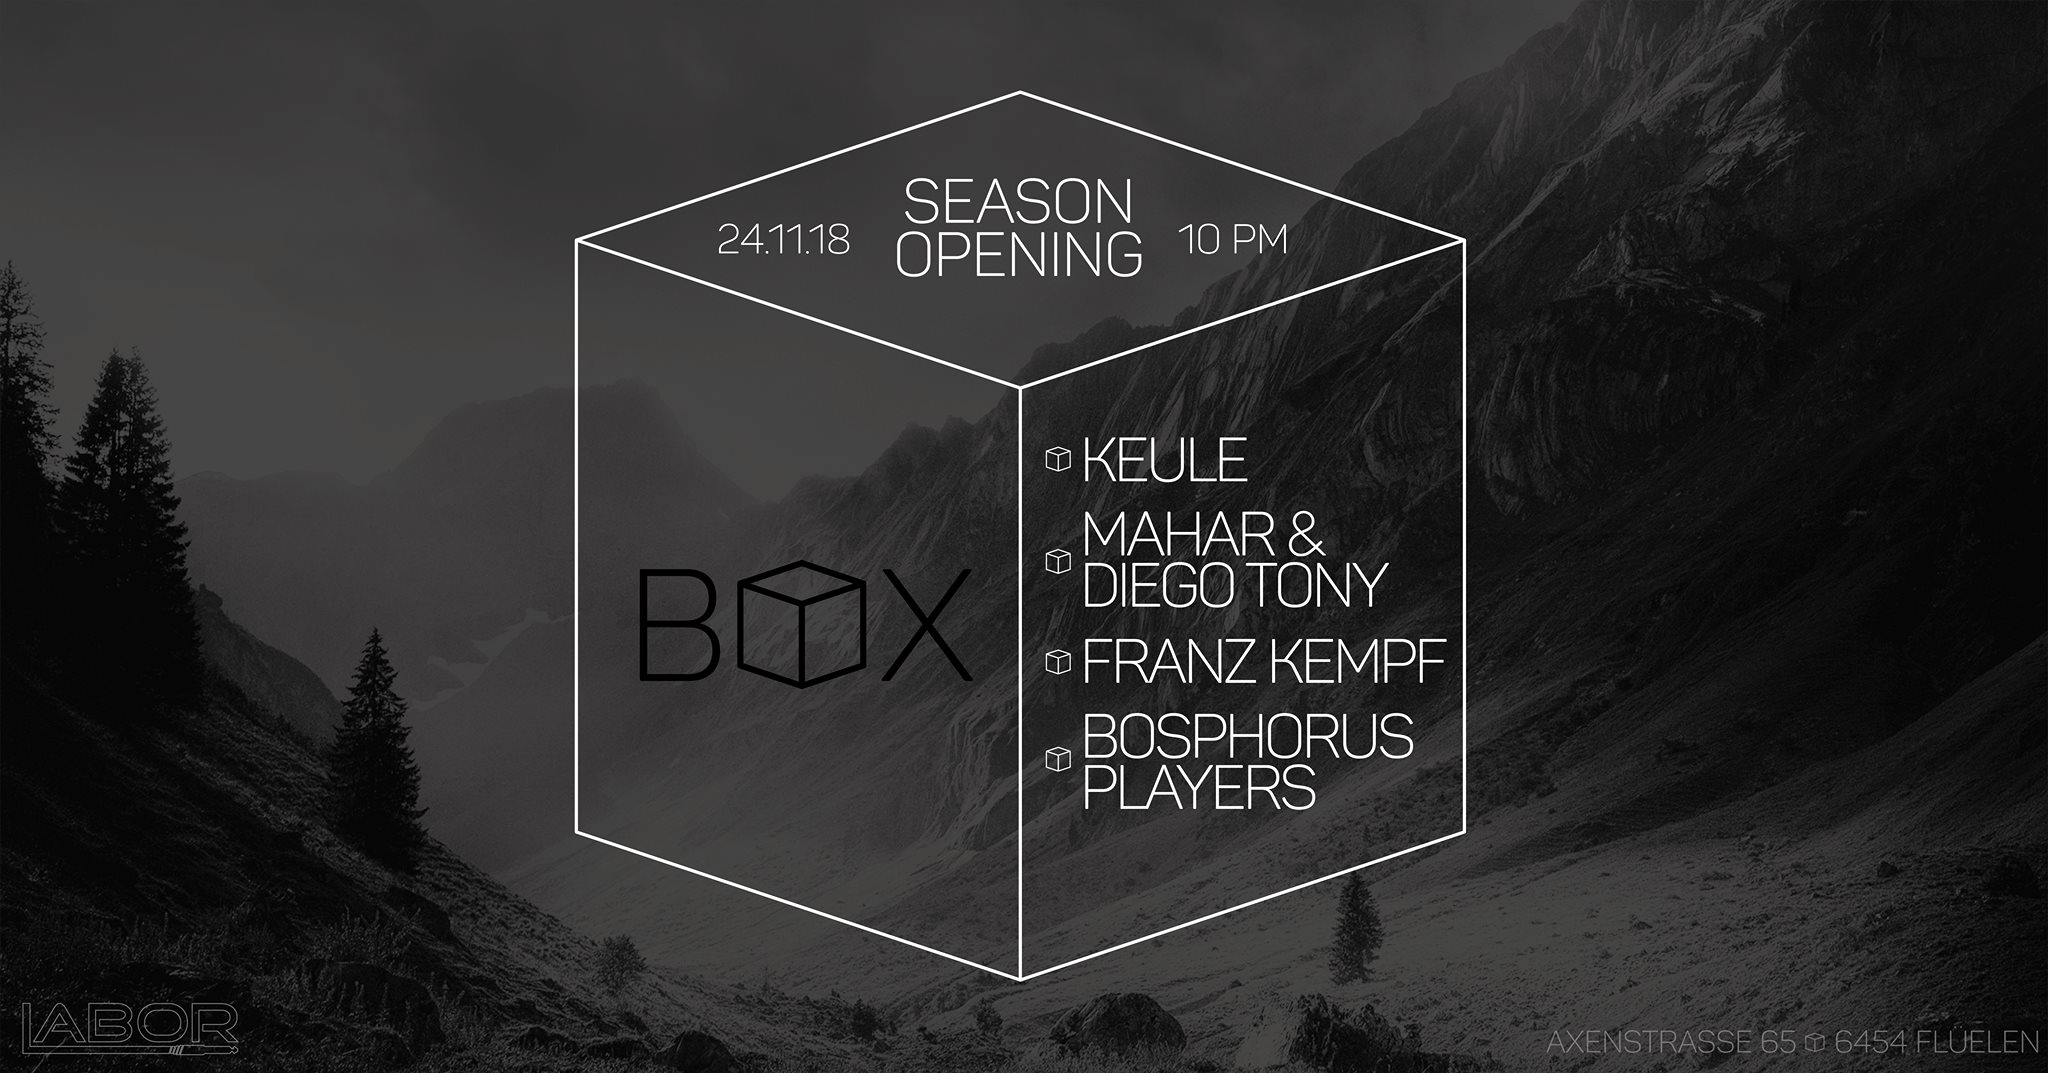 box-opening-11-2018jpg